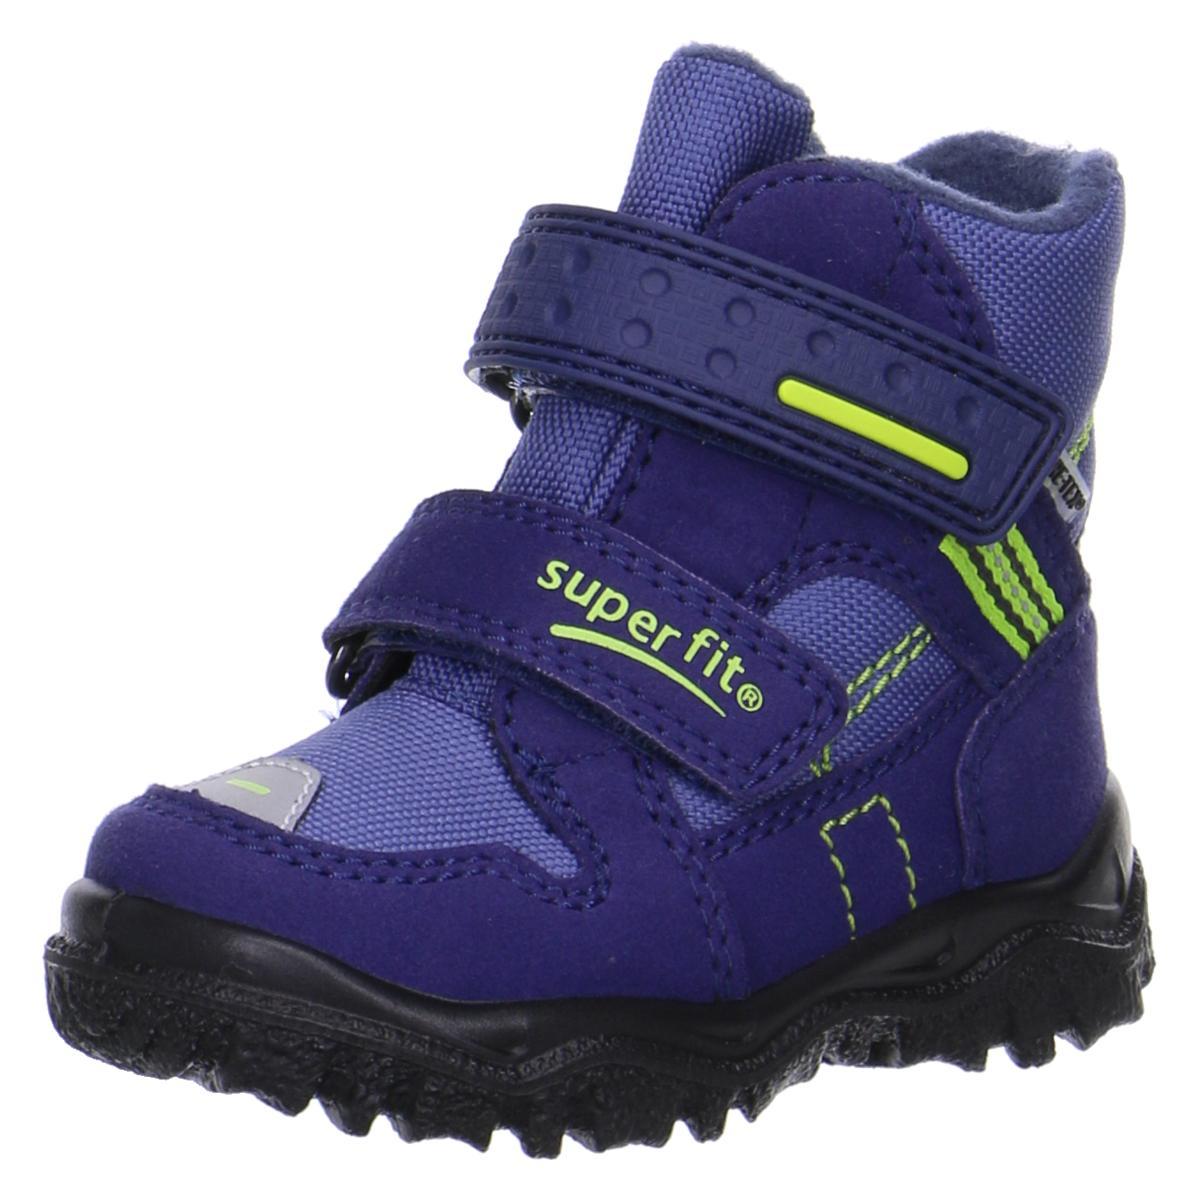 SUPERFIT škornji Husky1 - modri - vel. 20 - Ceneje.si 186ca303e9